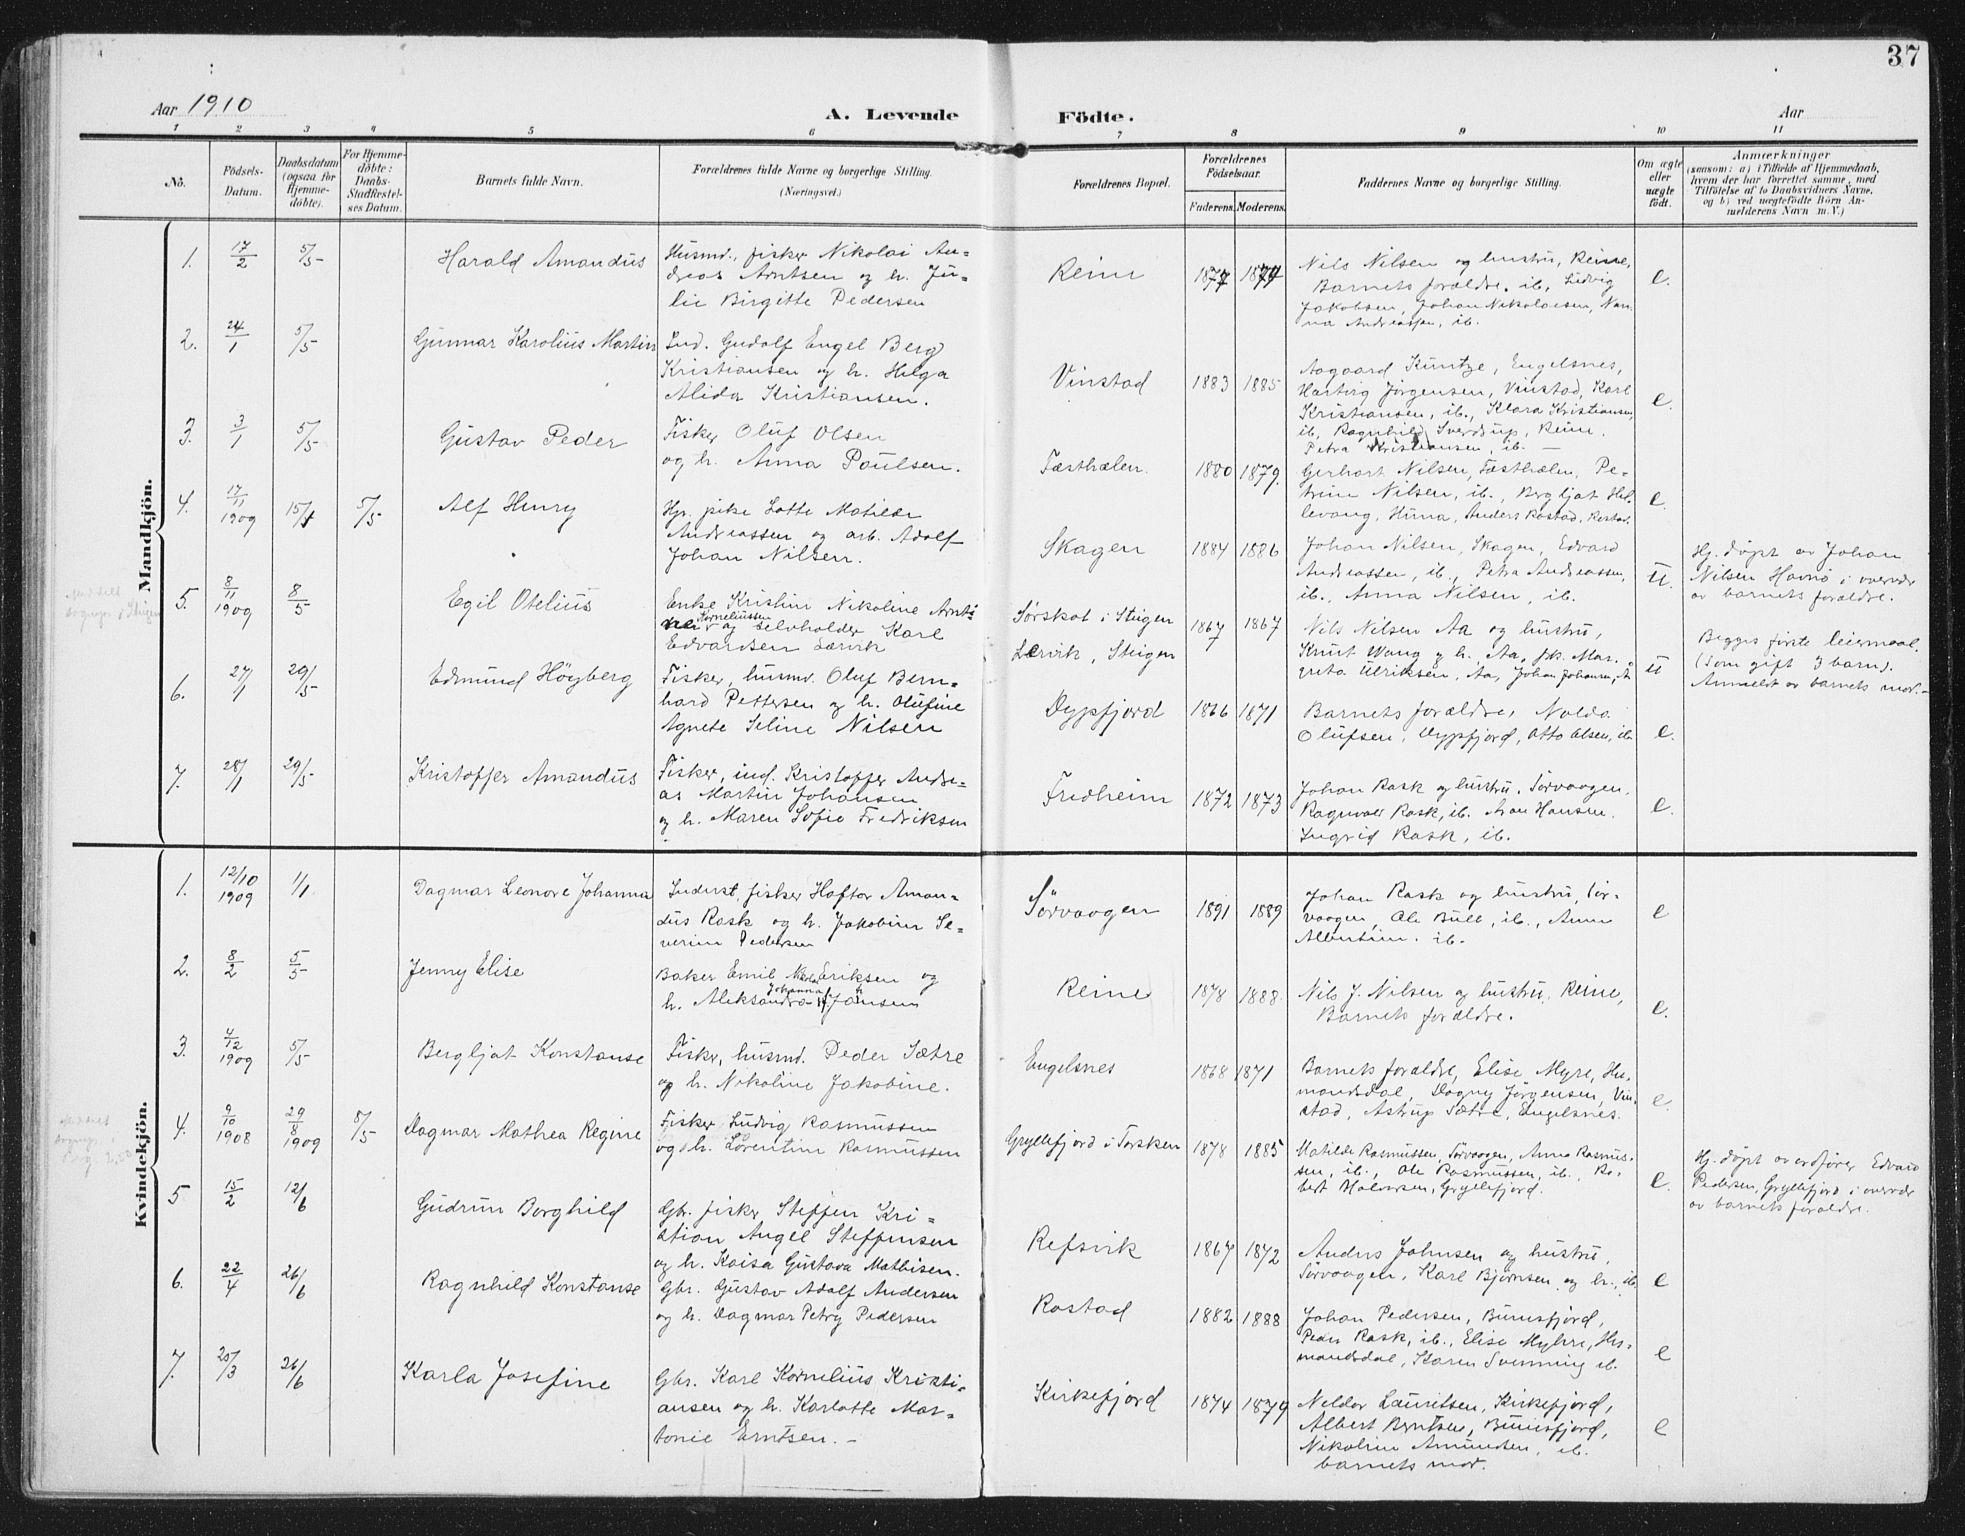 SAT, Ministerialprotokoller, klokkerbøker og fødselsregistre - Nordland, 886/L1221: Ministerialbok nr. 886A03, 1903-1913, s. 37